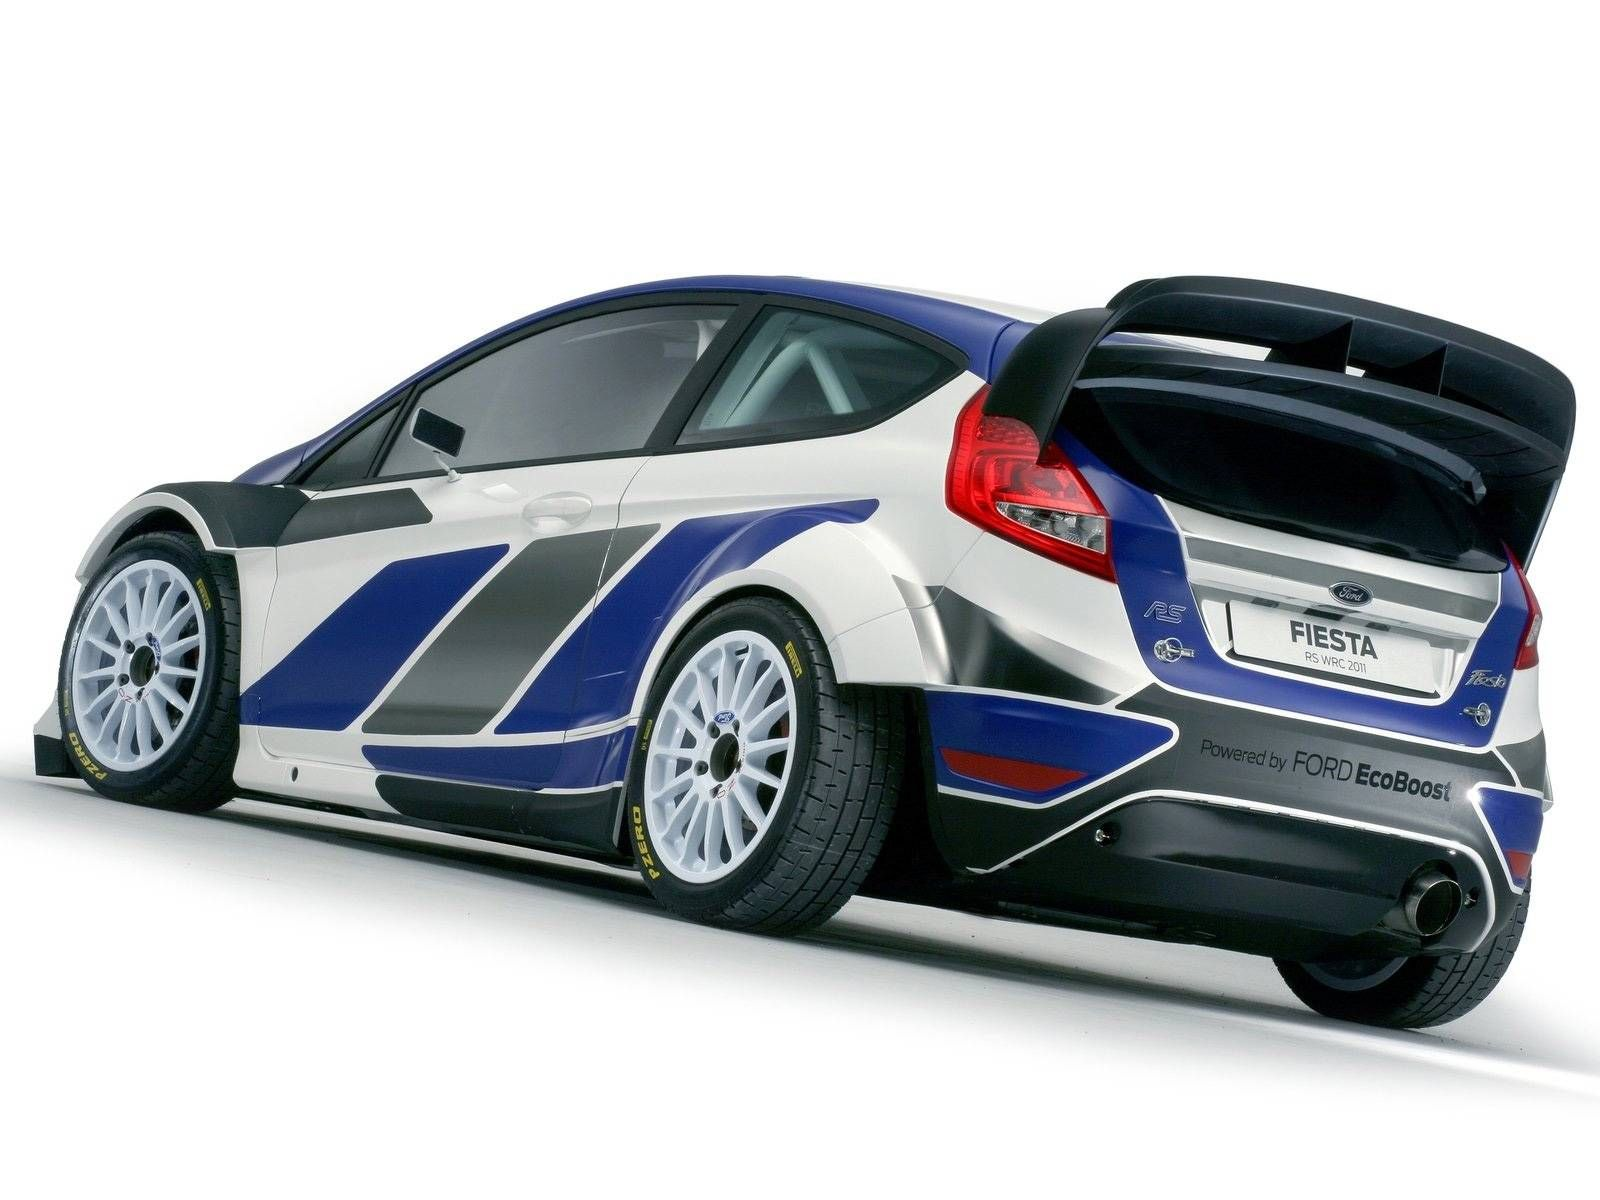 2011 Ford Fiesta Rs Wrc These Look Like So Much Fun Racing Car Design Rally Car Rally Car Racing